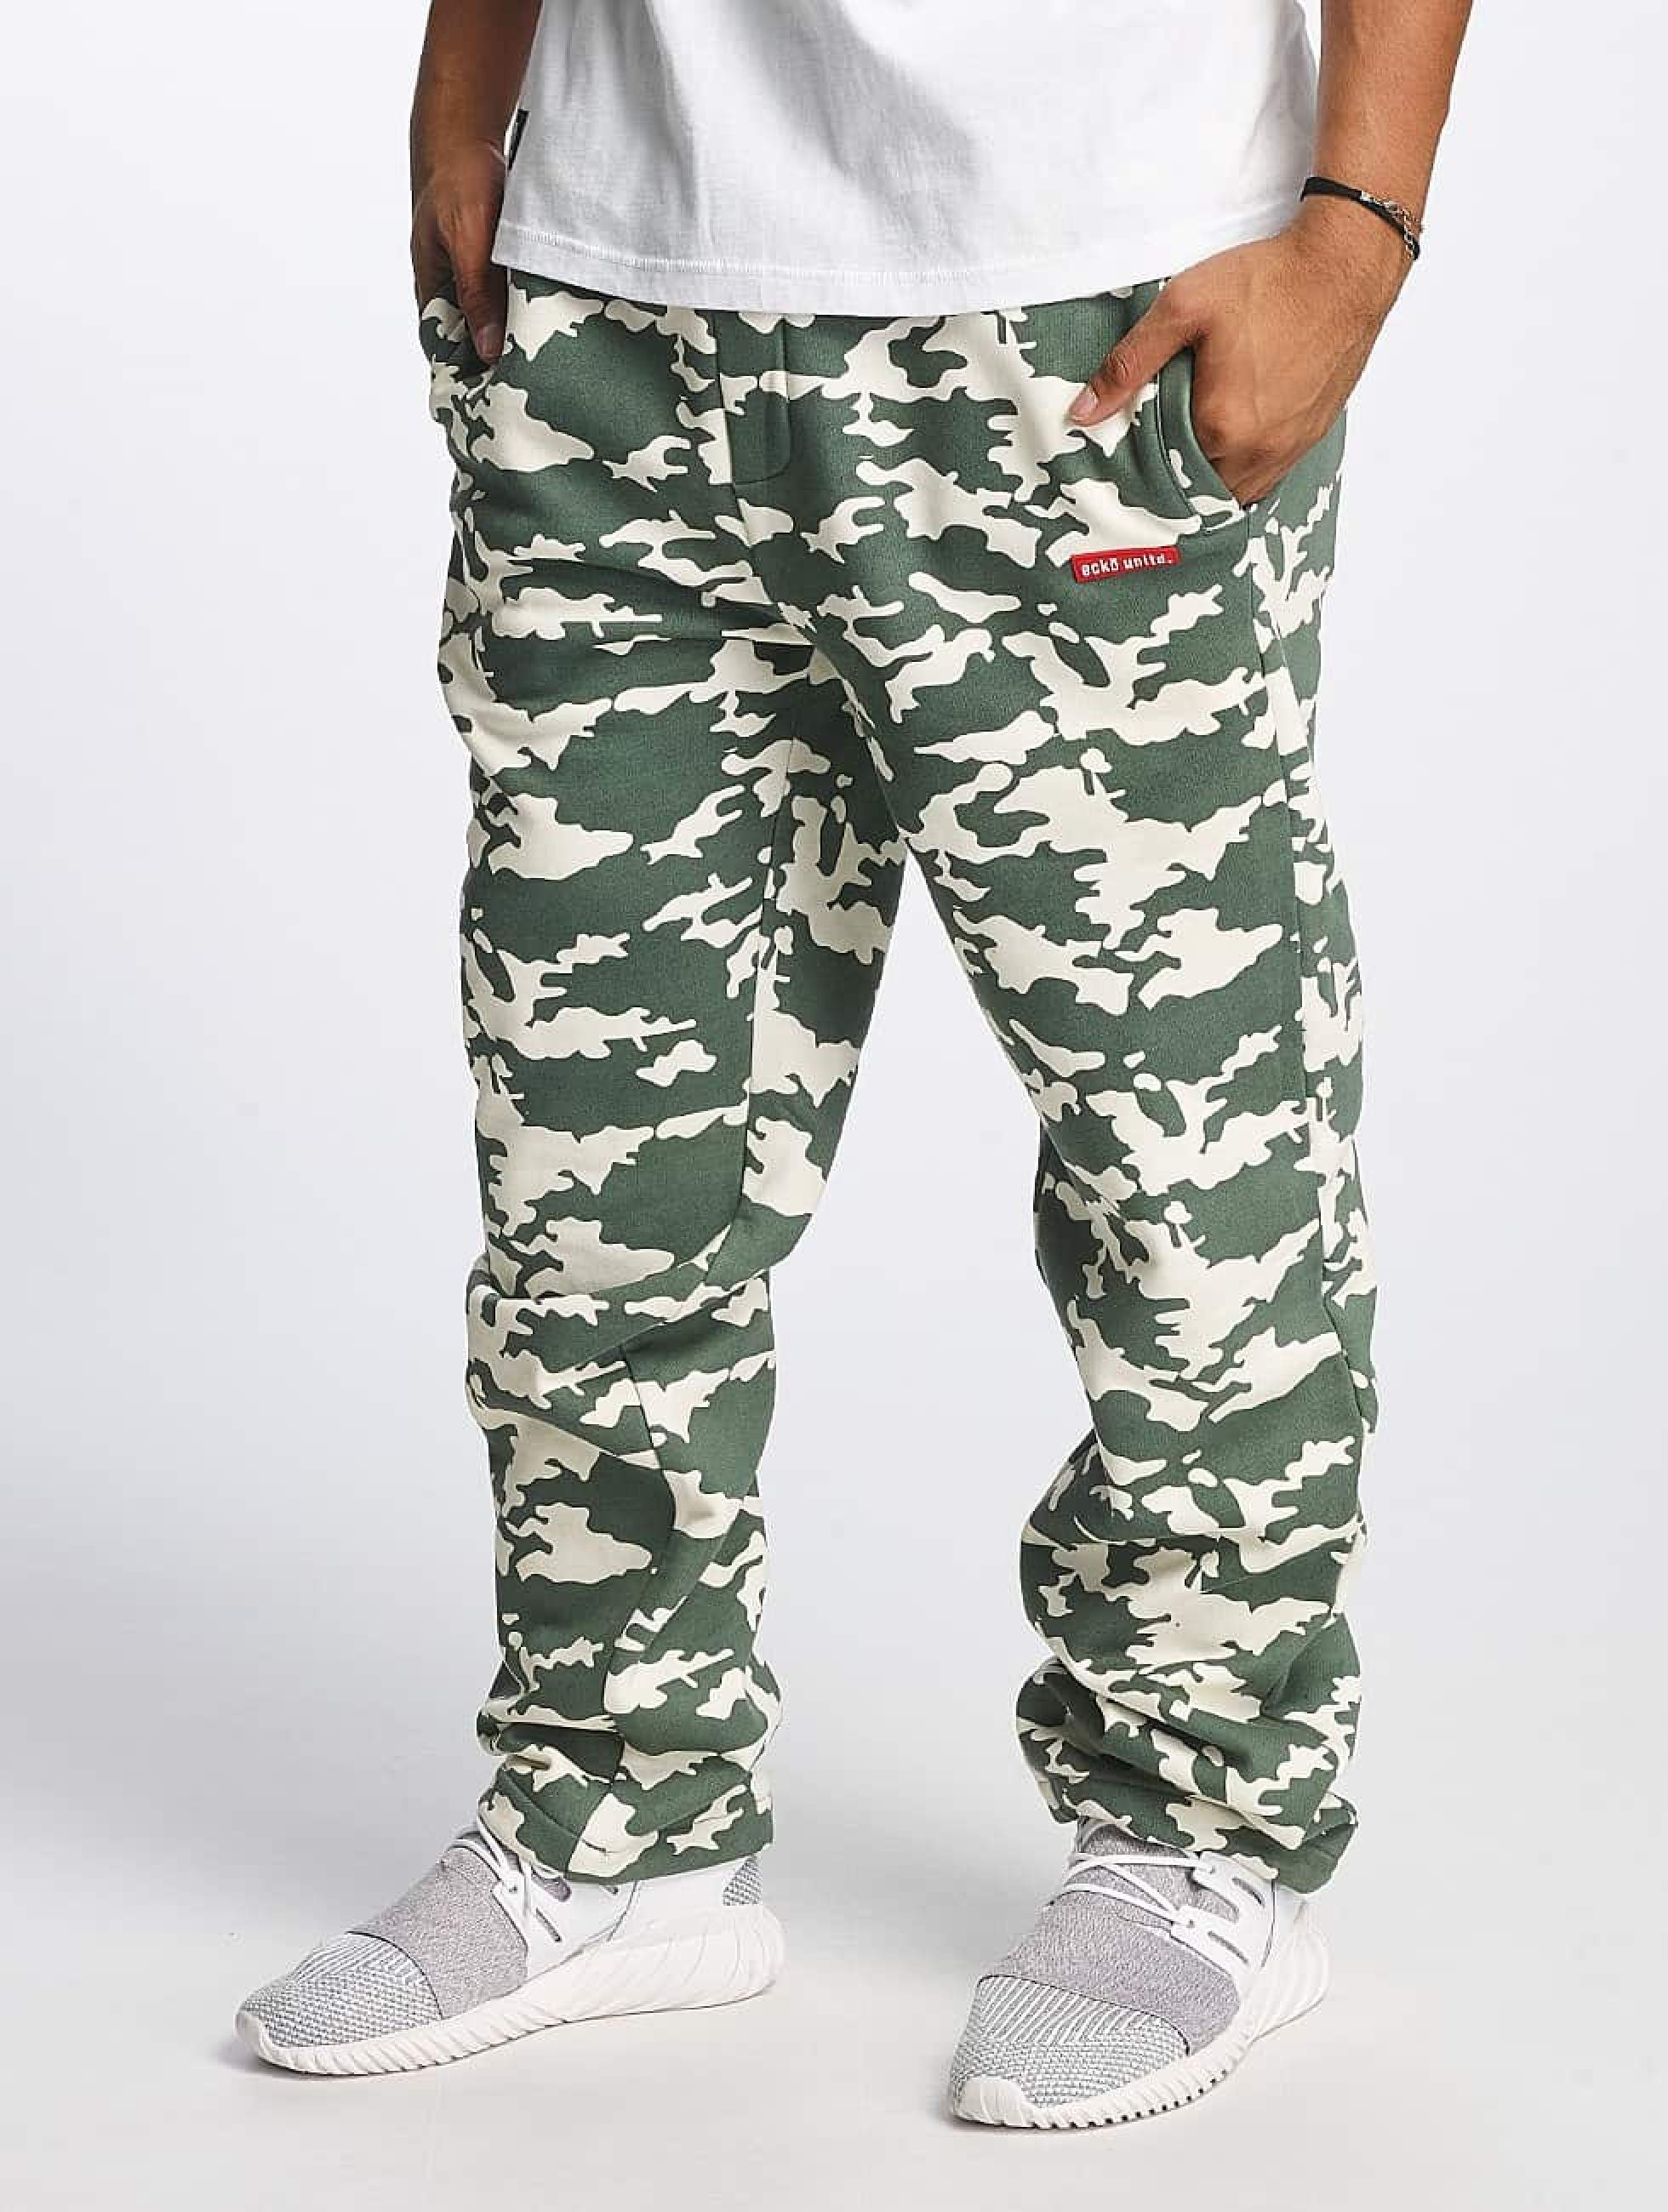 Ecko Unltd. / Sweat Pant BananaBeach in camouflage M